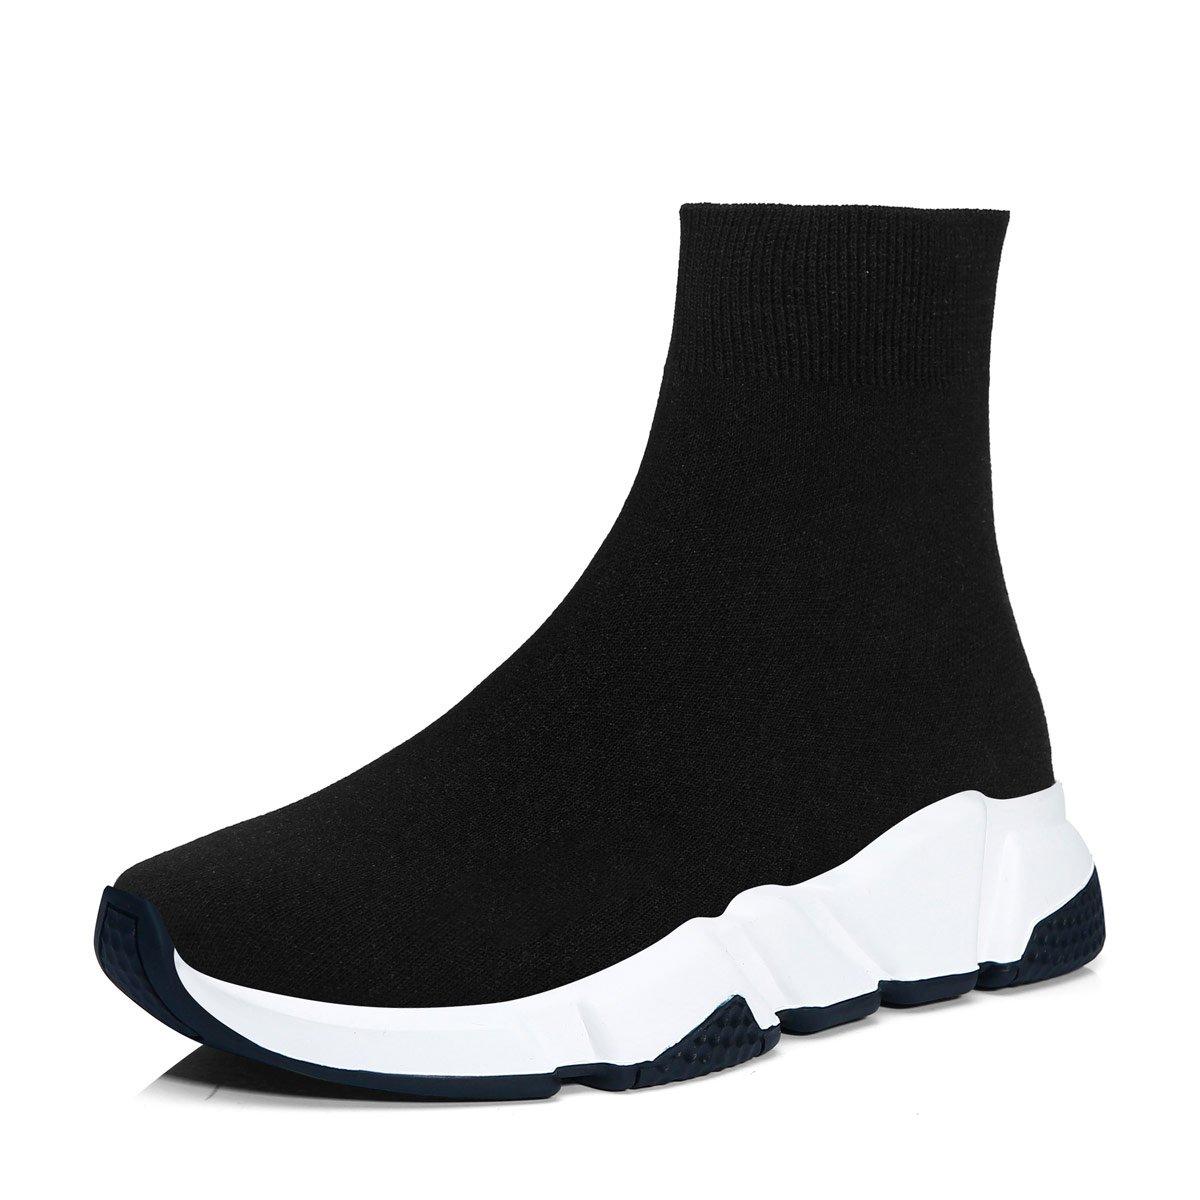 Hommes 15373 Femmes Respirant Mode Sliper Outdoor Chaussures Léger Respirant Baskets athlétique Baskets Sneakers Noir/Blanc 2333d8d - boatplans.space